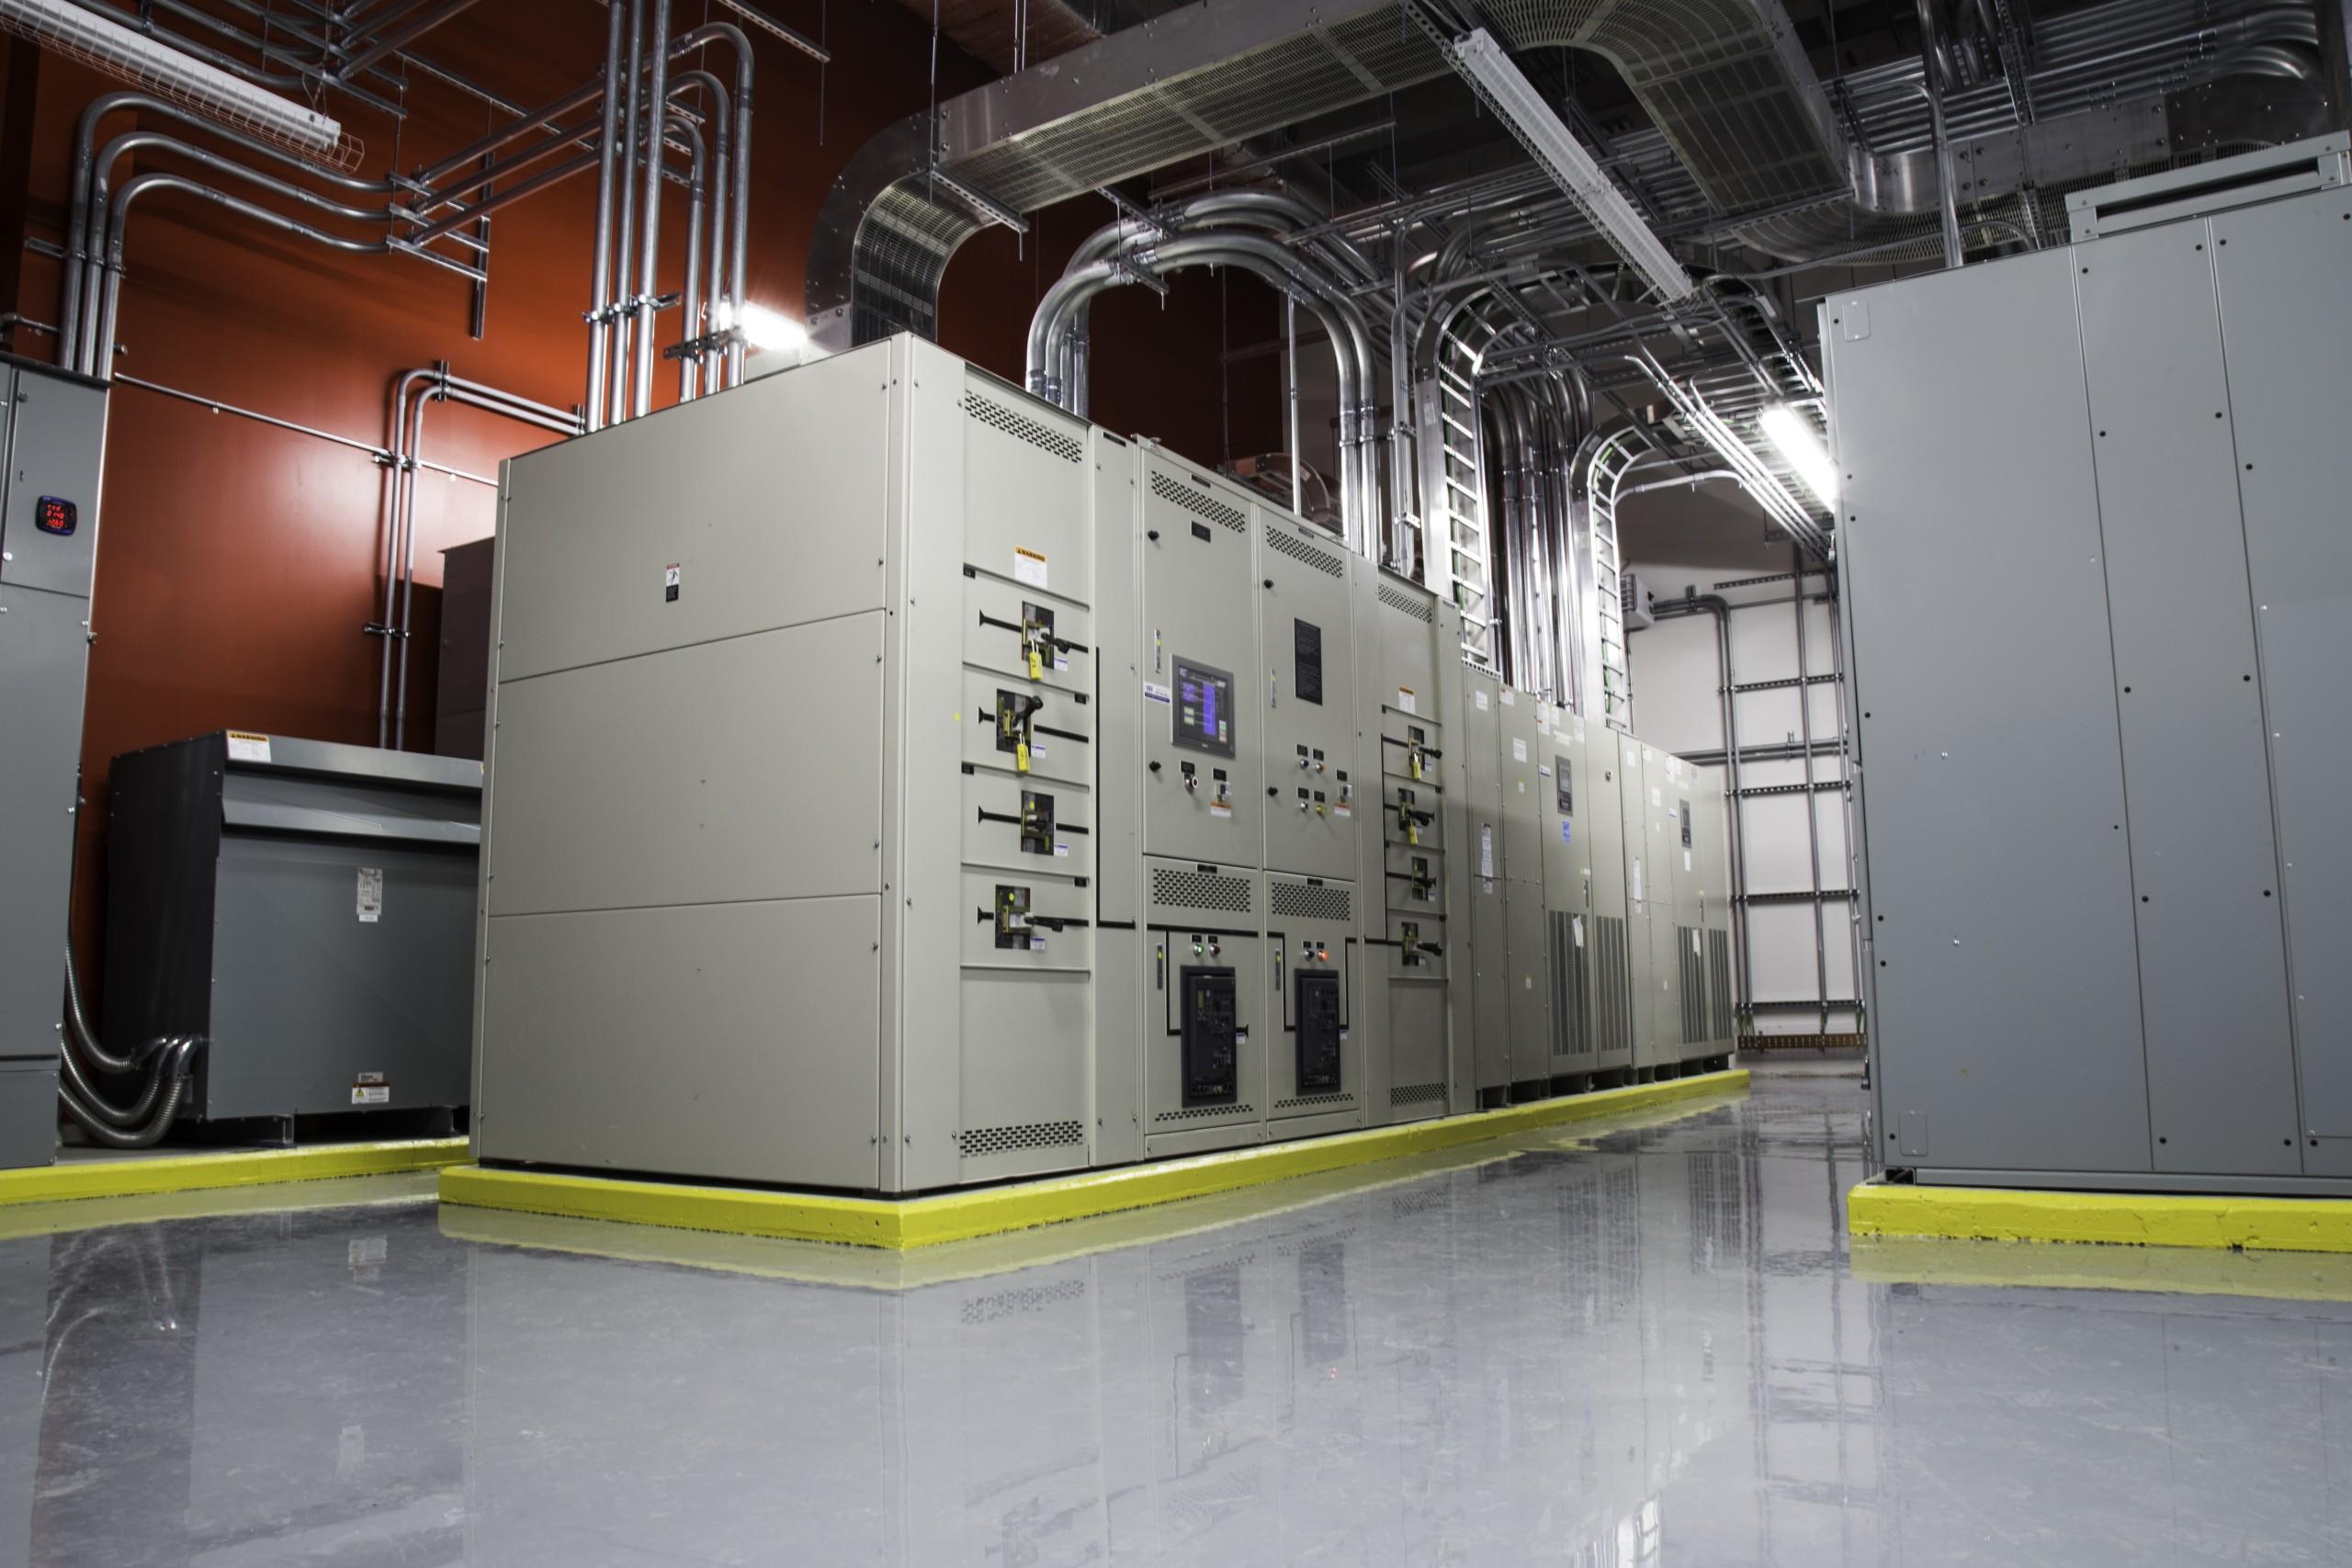 VEERUM is now using eStruxture's data center in Calgary